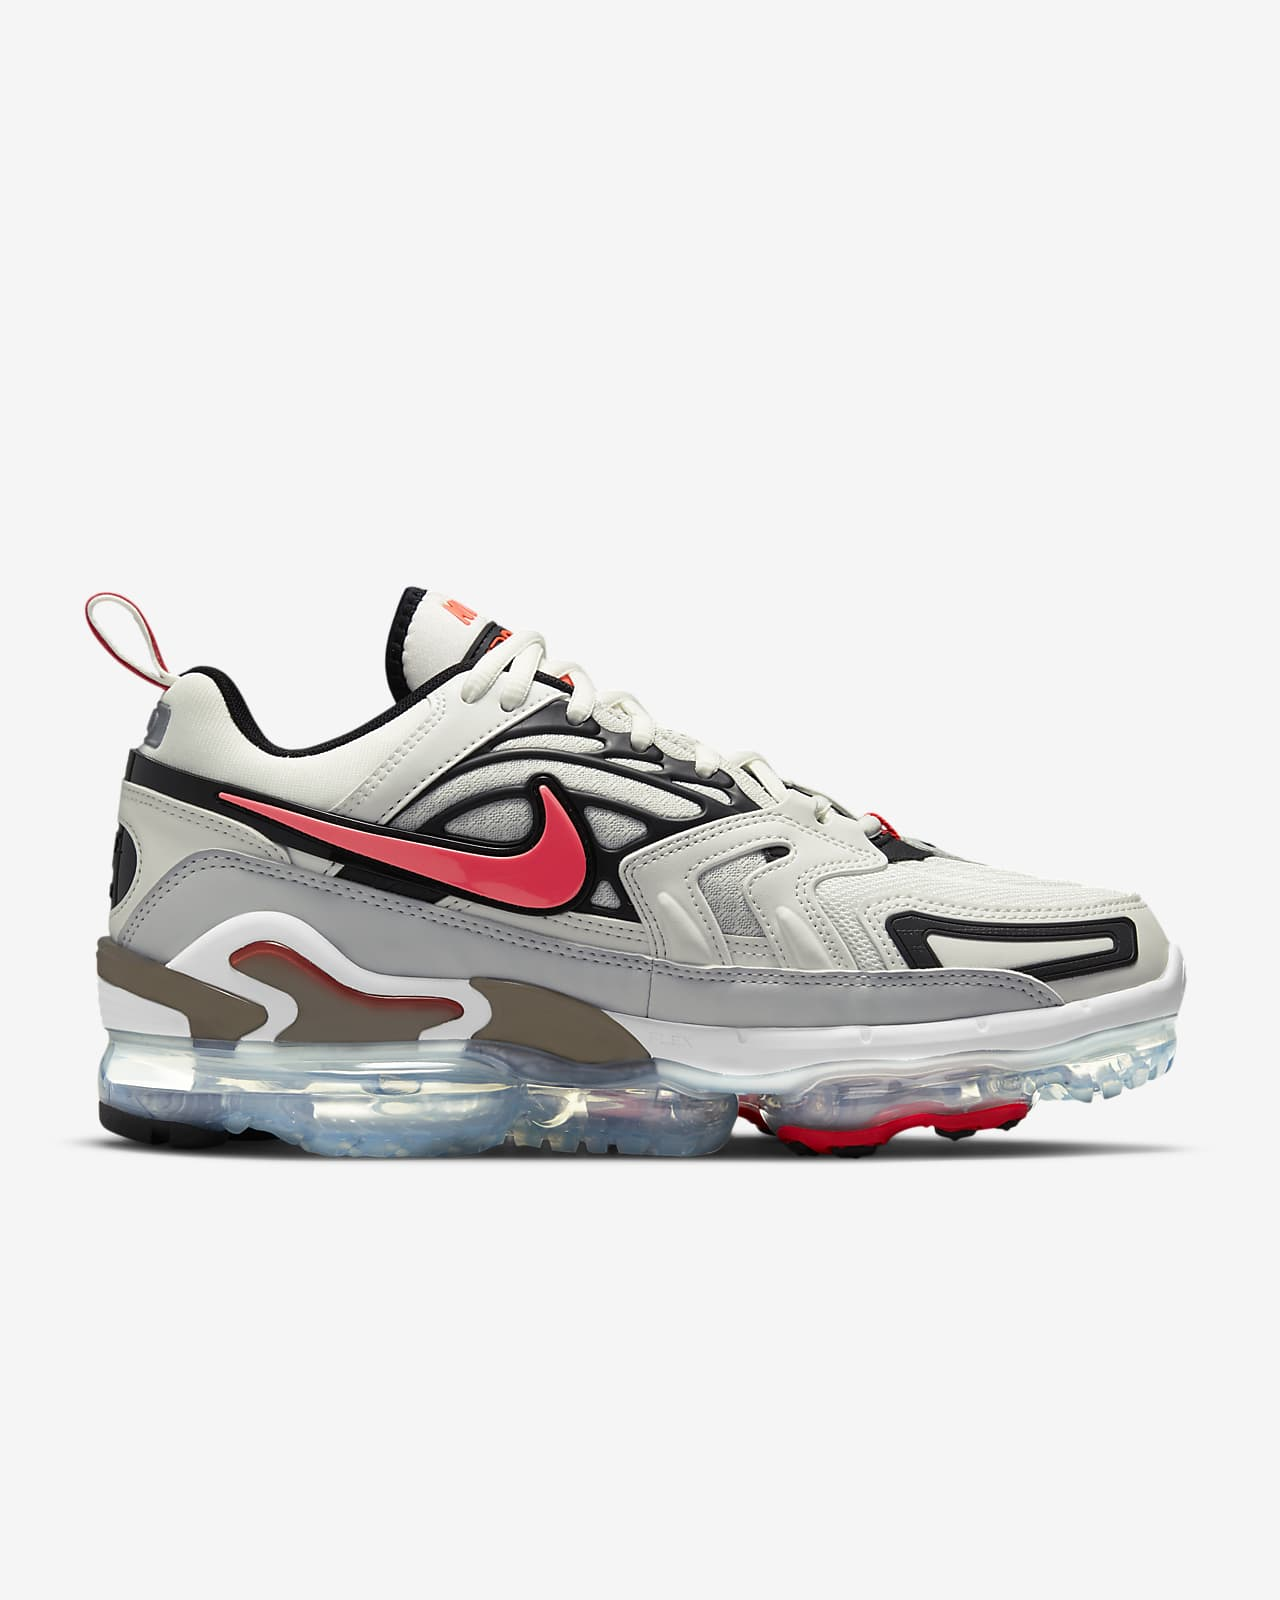 Nike Air Vapormax Evo Men's Shoes